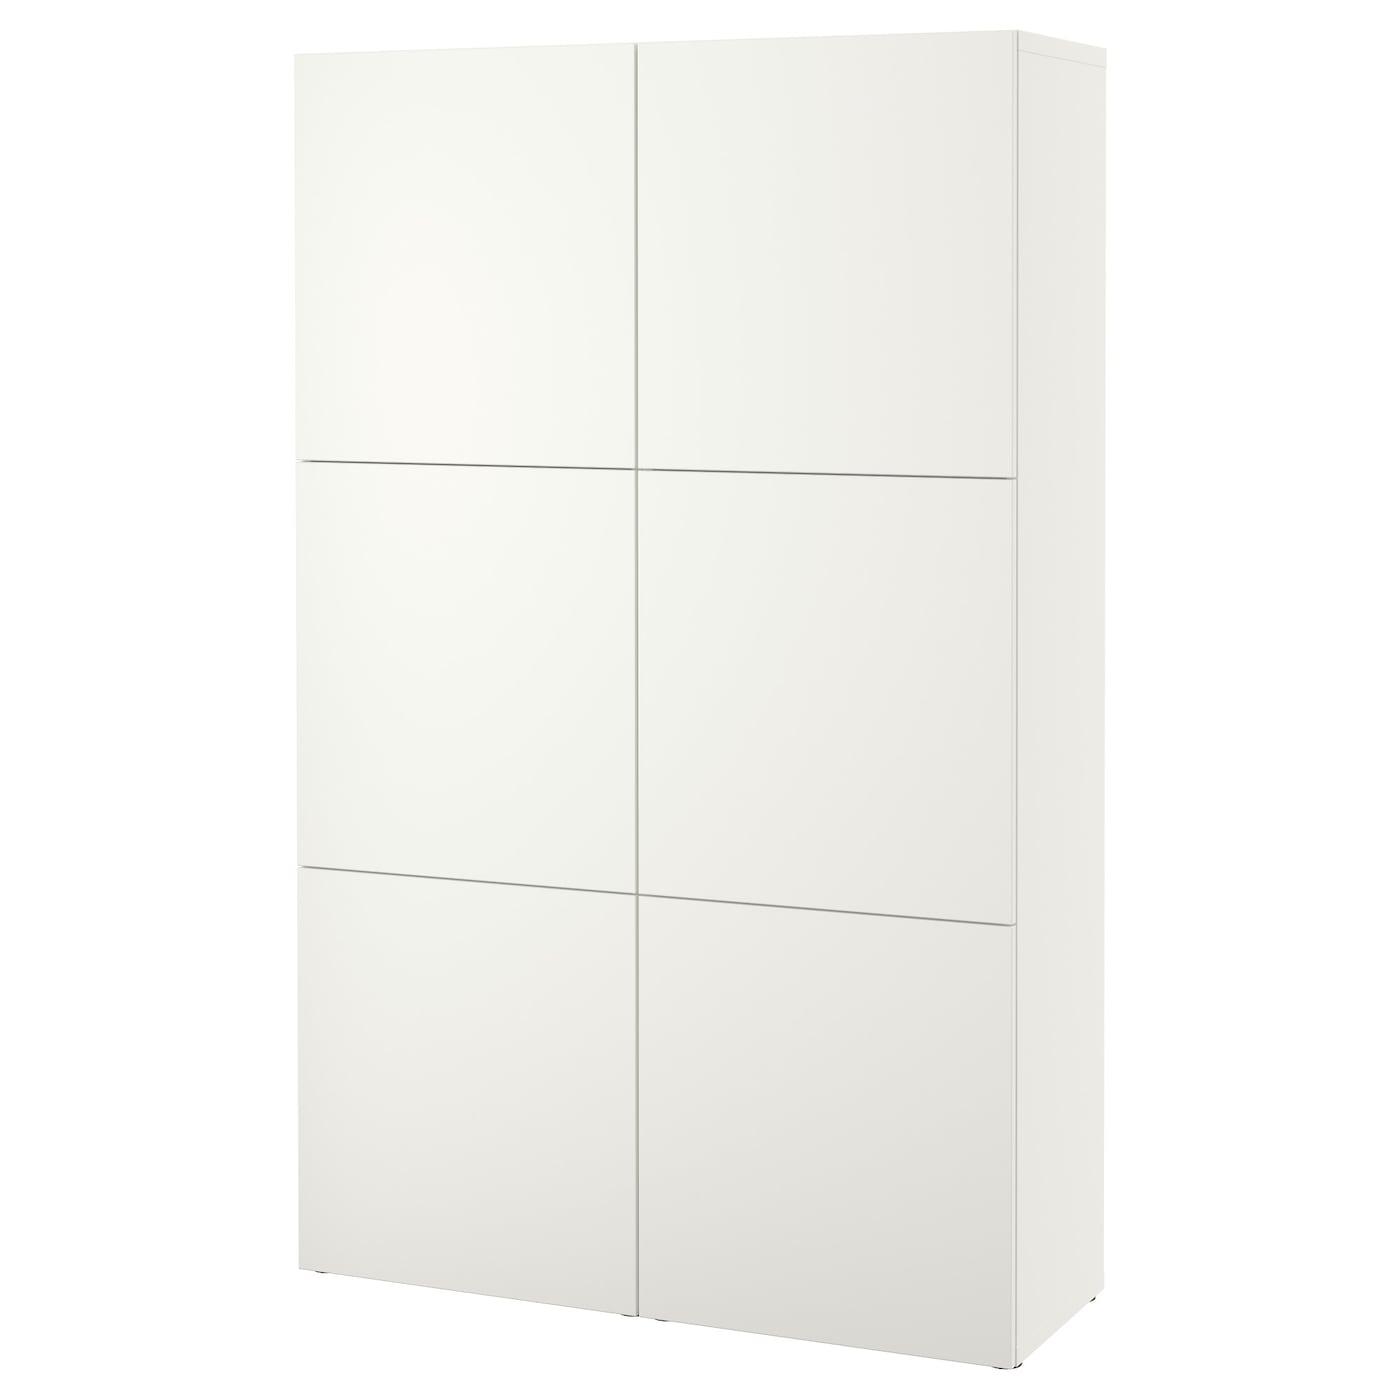 Bestå Storage Combination With Doors Lappviken White 120x40x192 Cm Ikea